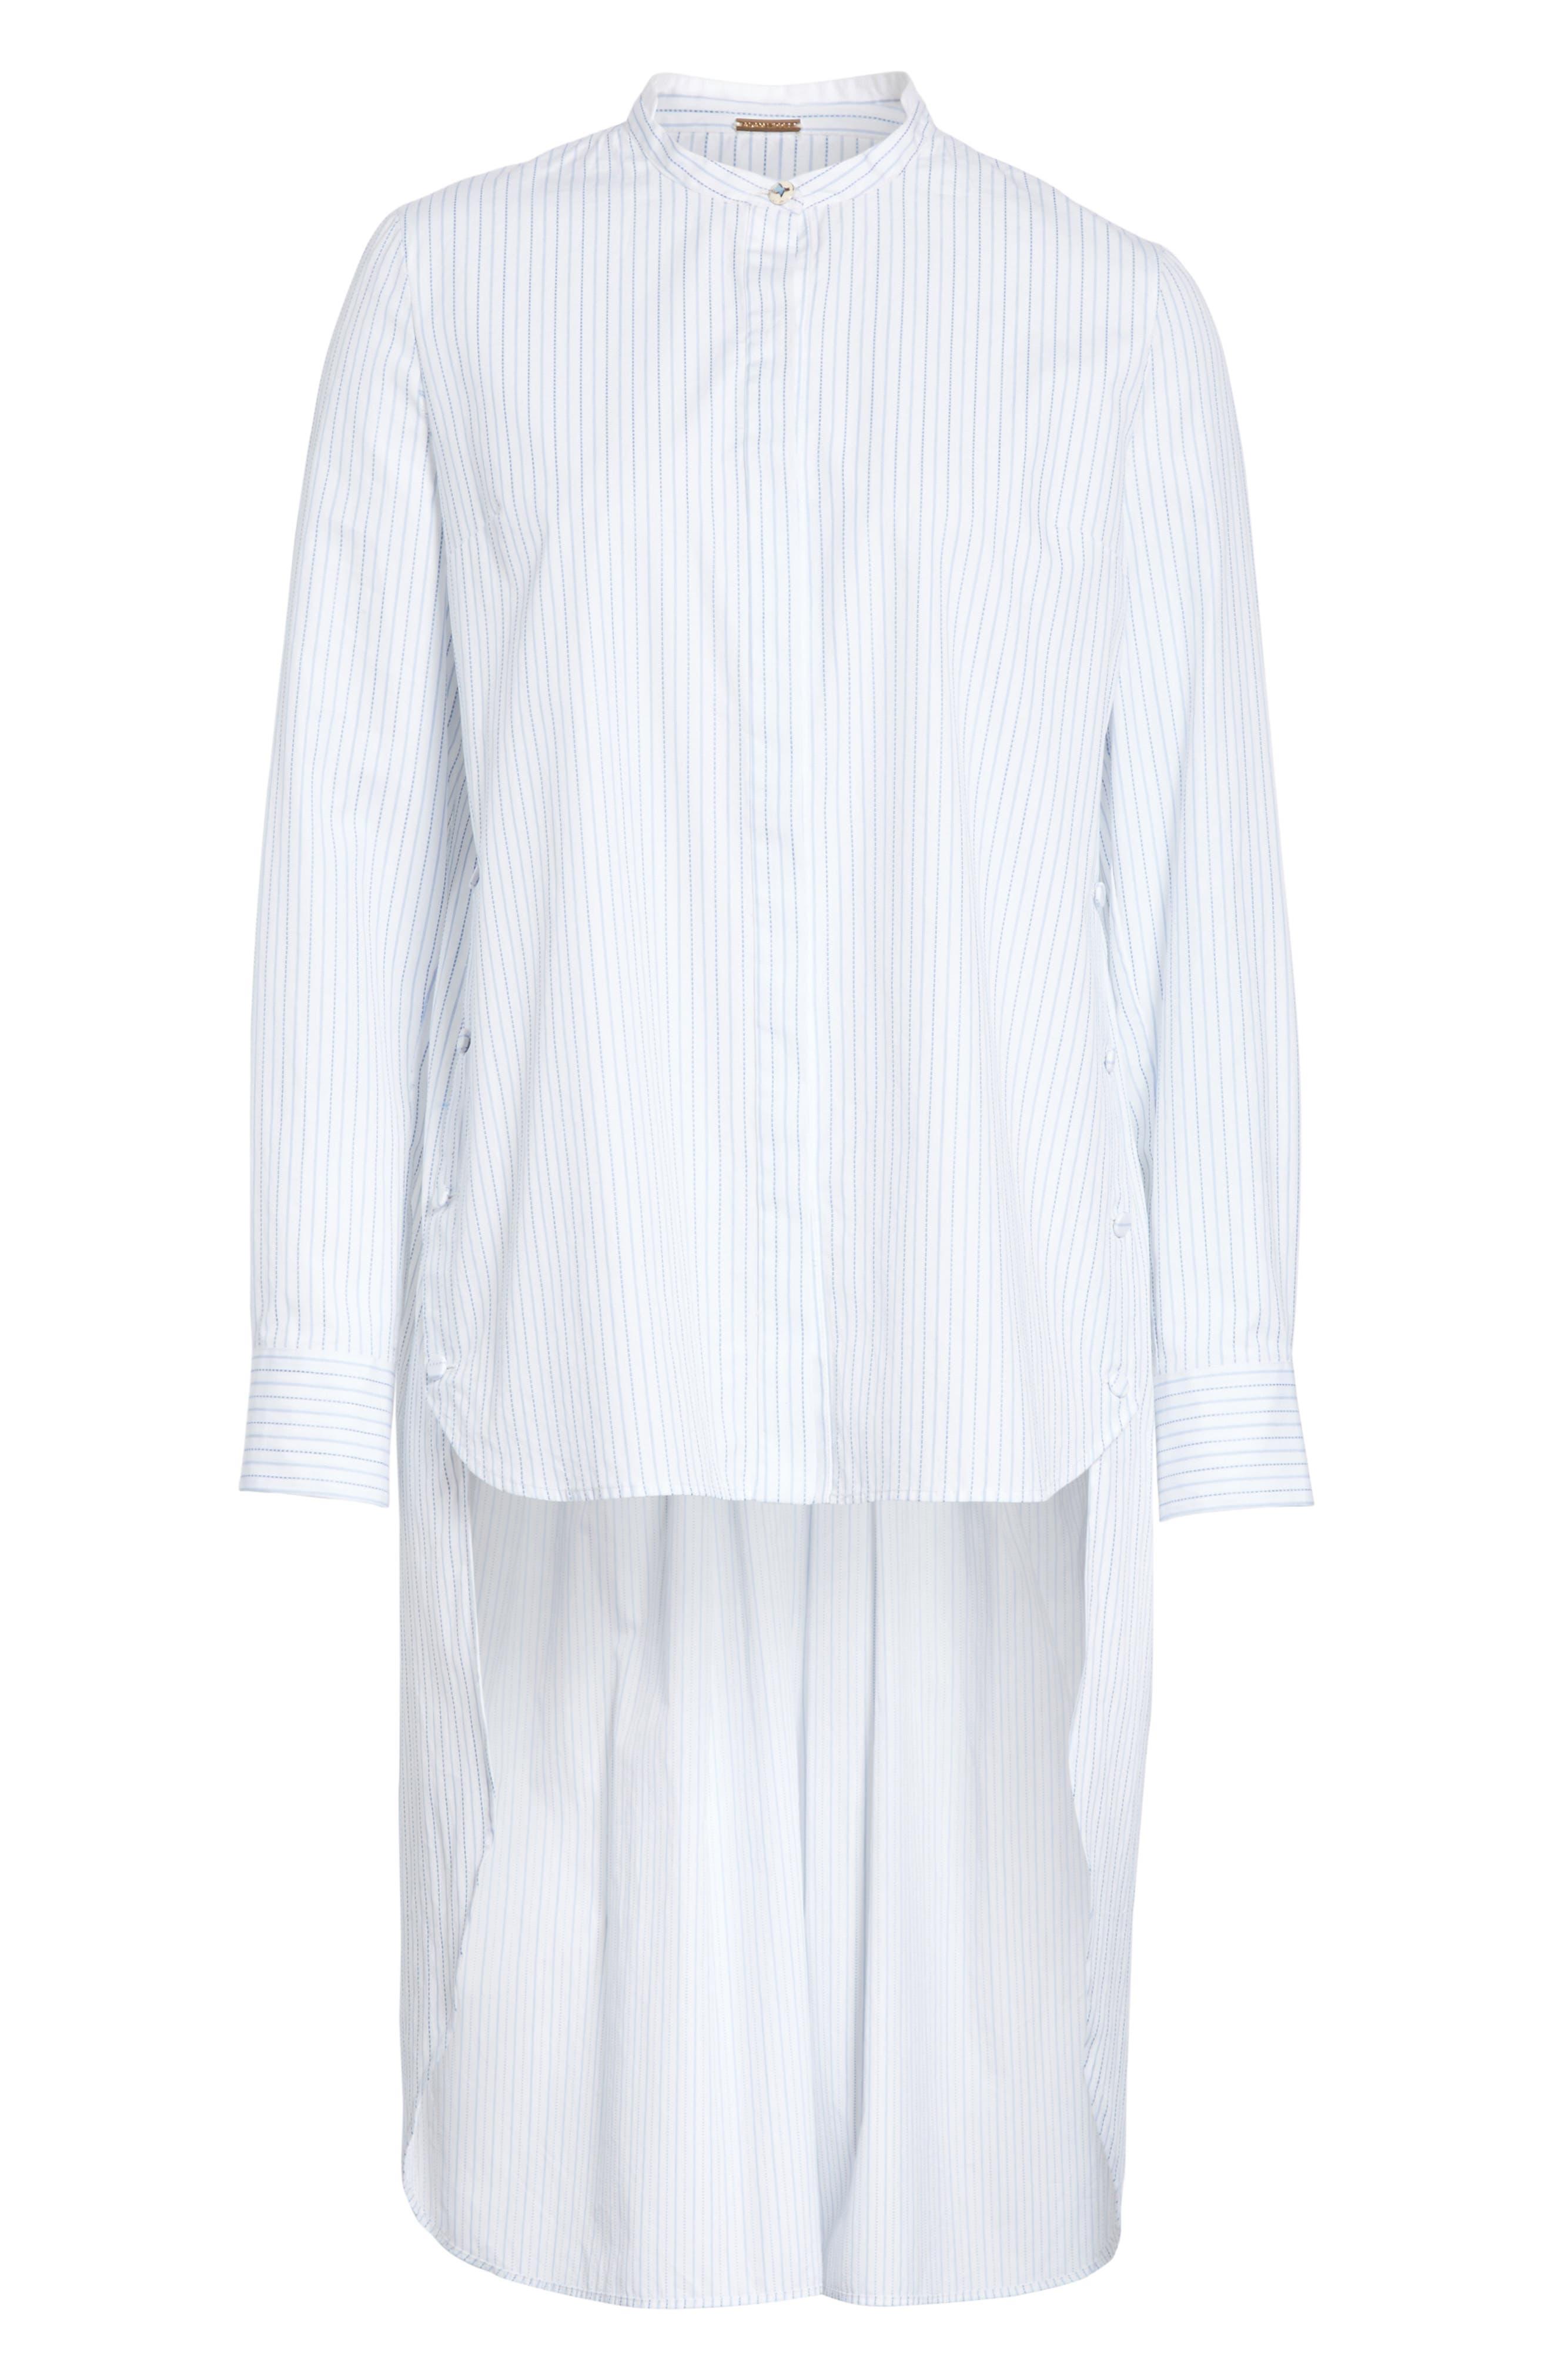 High/Low Stripe Cotton Poplin Shirt,                             Alternate thumbnail 6, color,                             White/ Blue